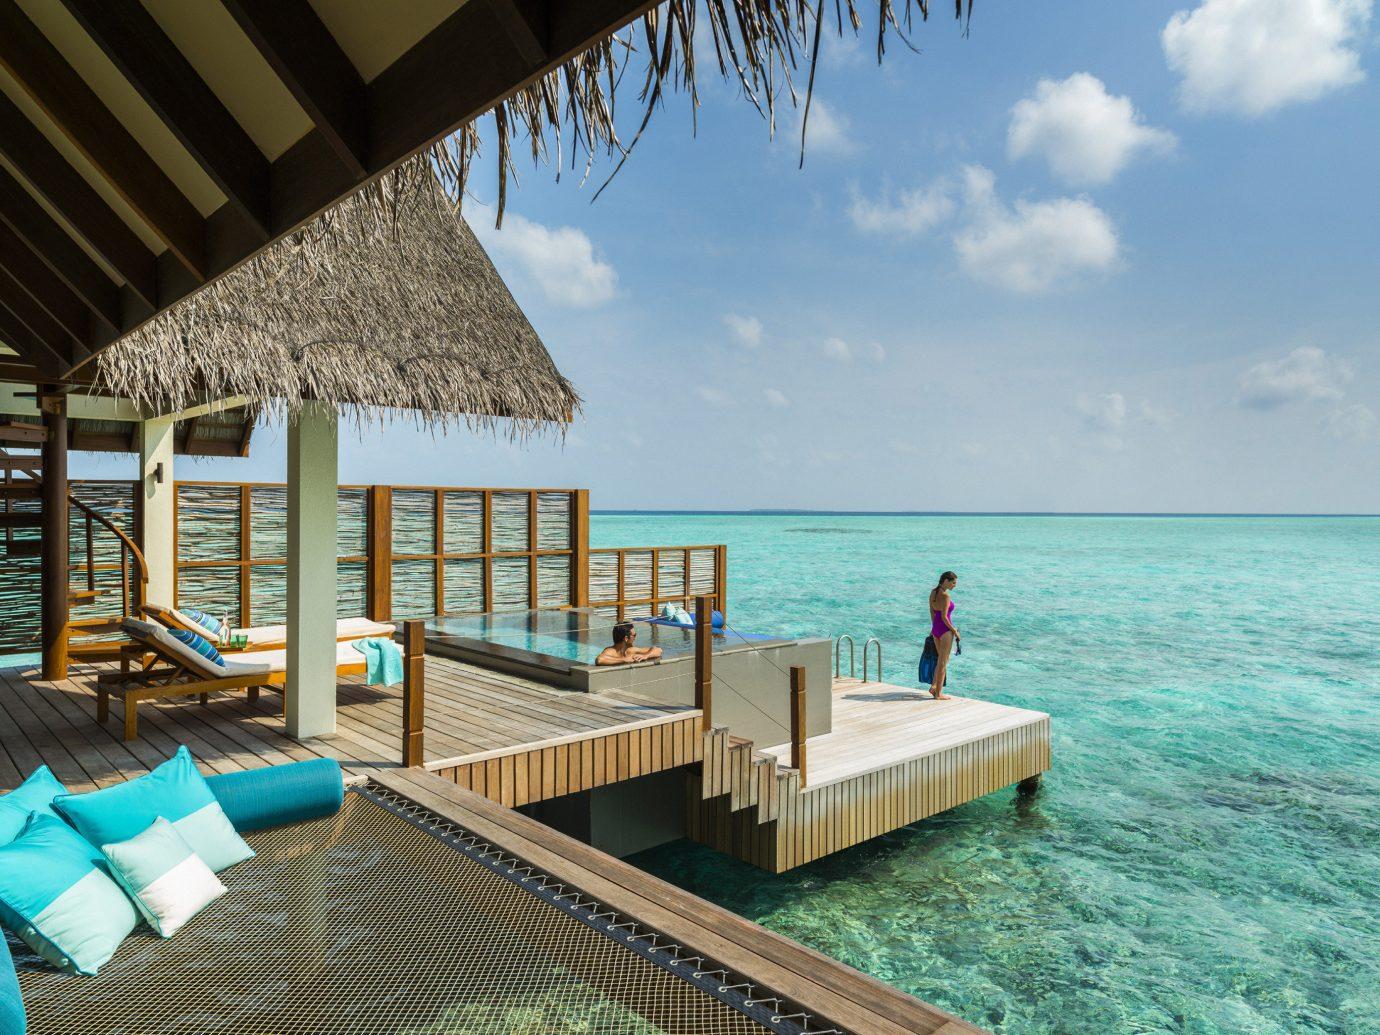 Trip Ideas sky outdoor water leisure vacation swimming pool Resort caribbean Ocean Sea estate Beach Villa overlooking Deck shore